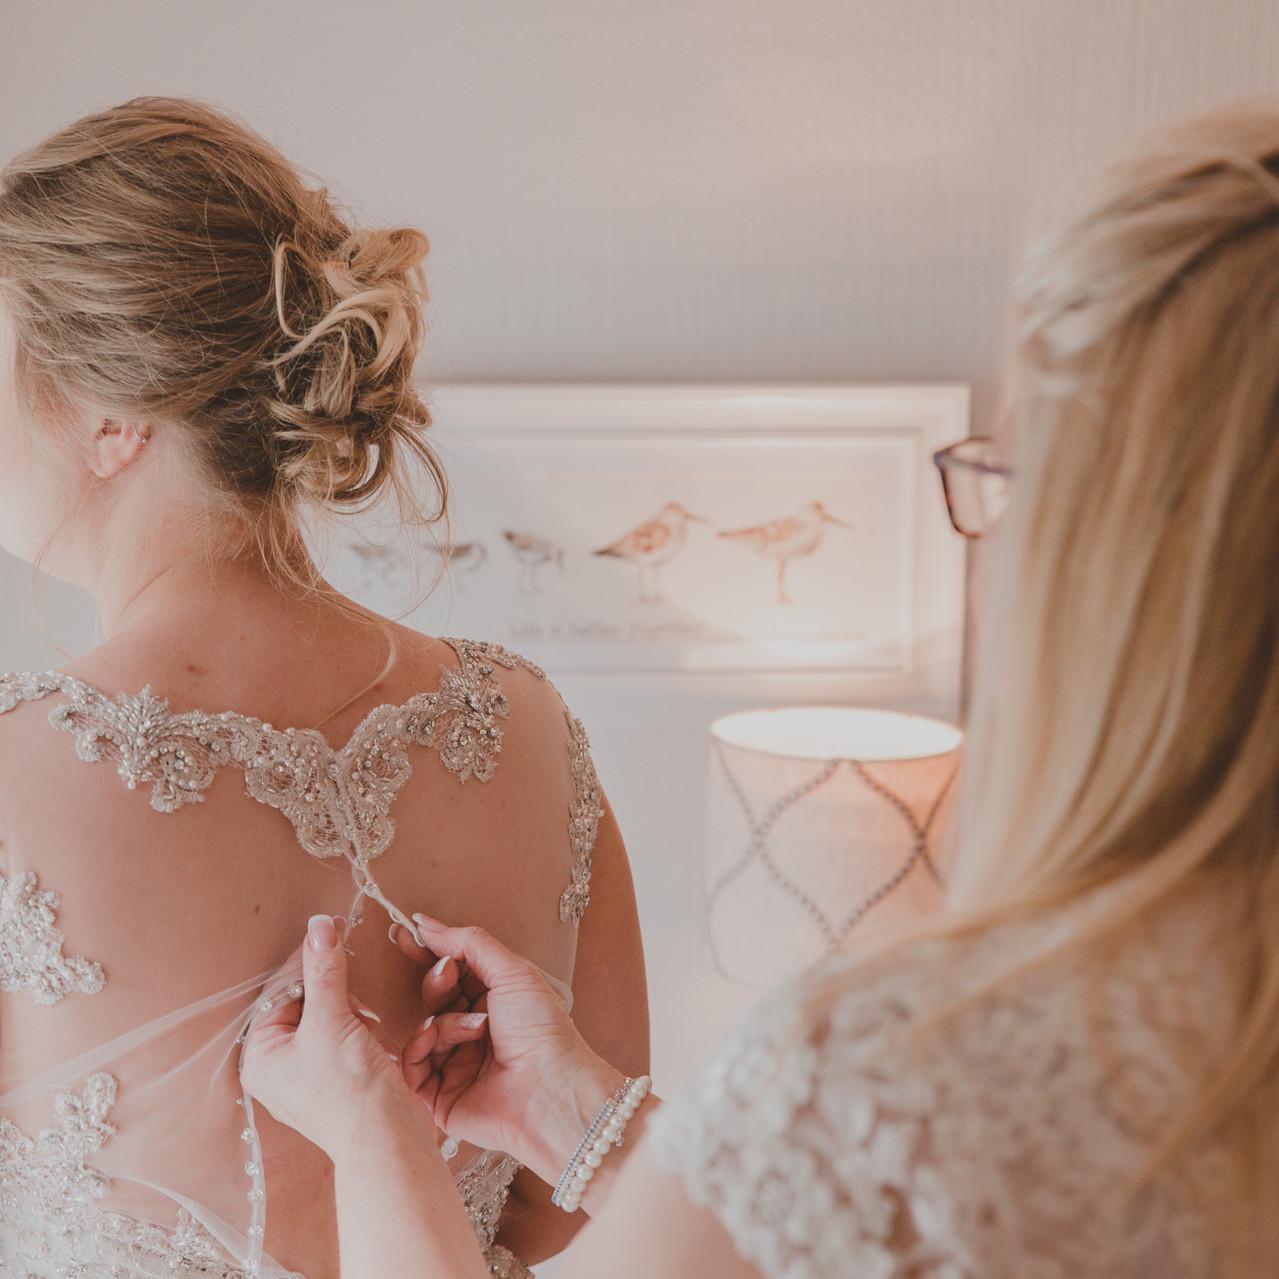 Fay Wedding - Thursford Collection at the Garden Pavilion, Norfolk. Doing Wedding dress